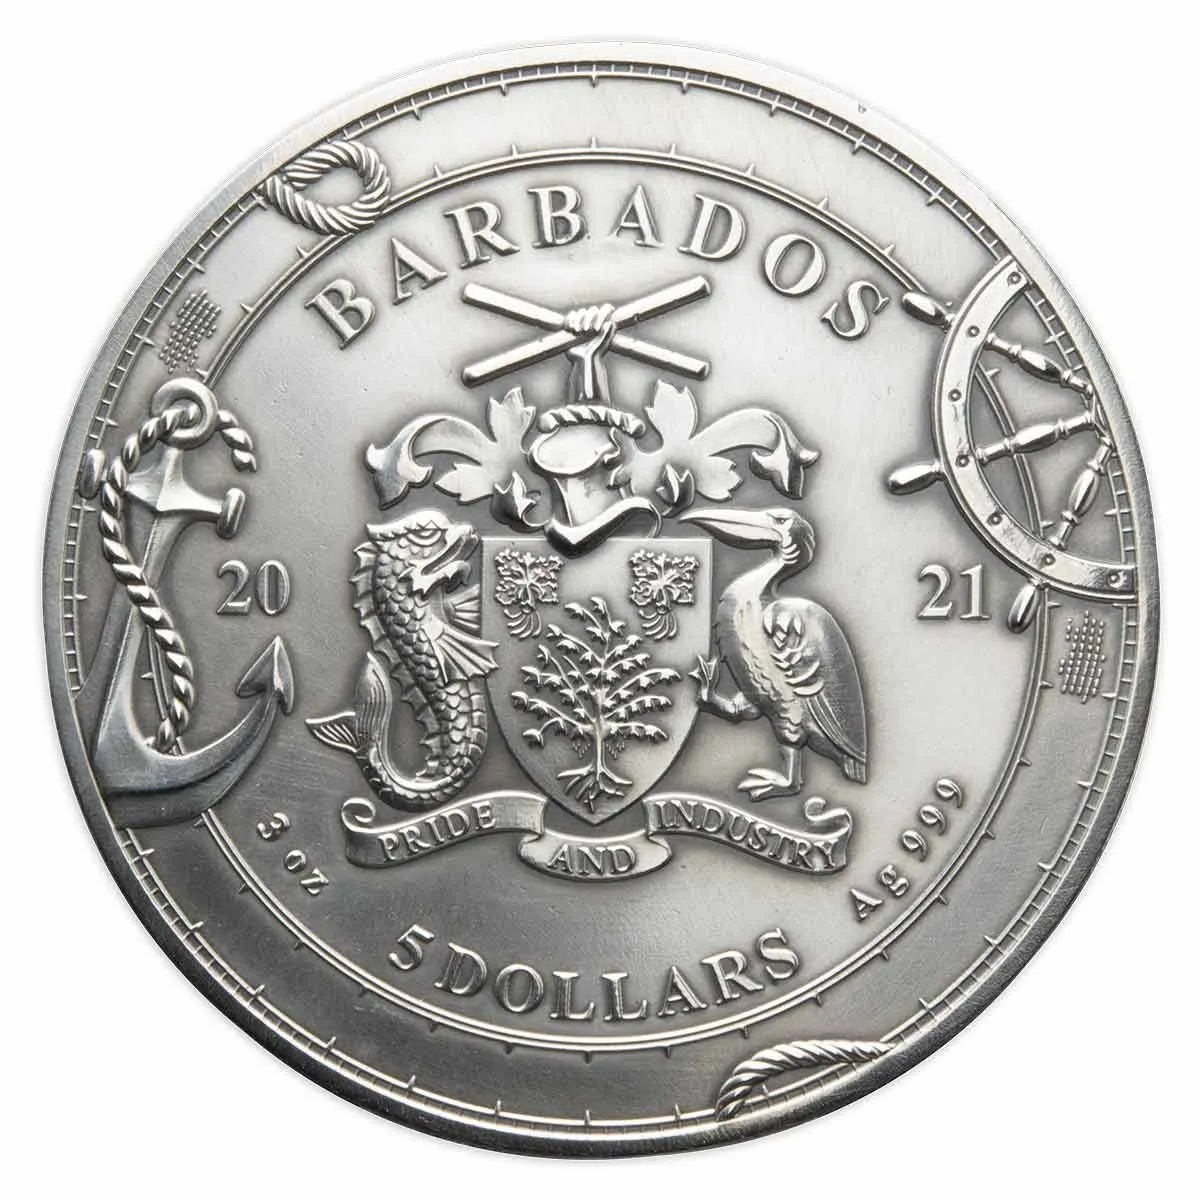 Барбадос монета 5 долларов Фердинанд Магеллан, аверс